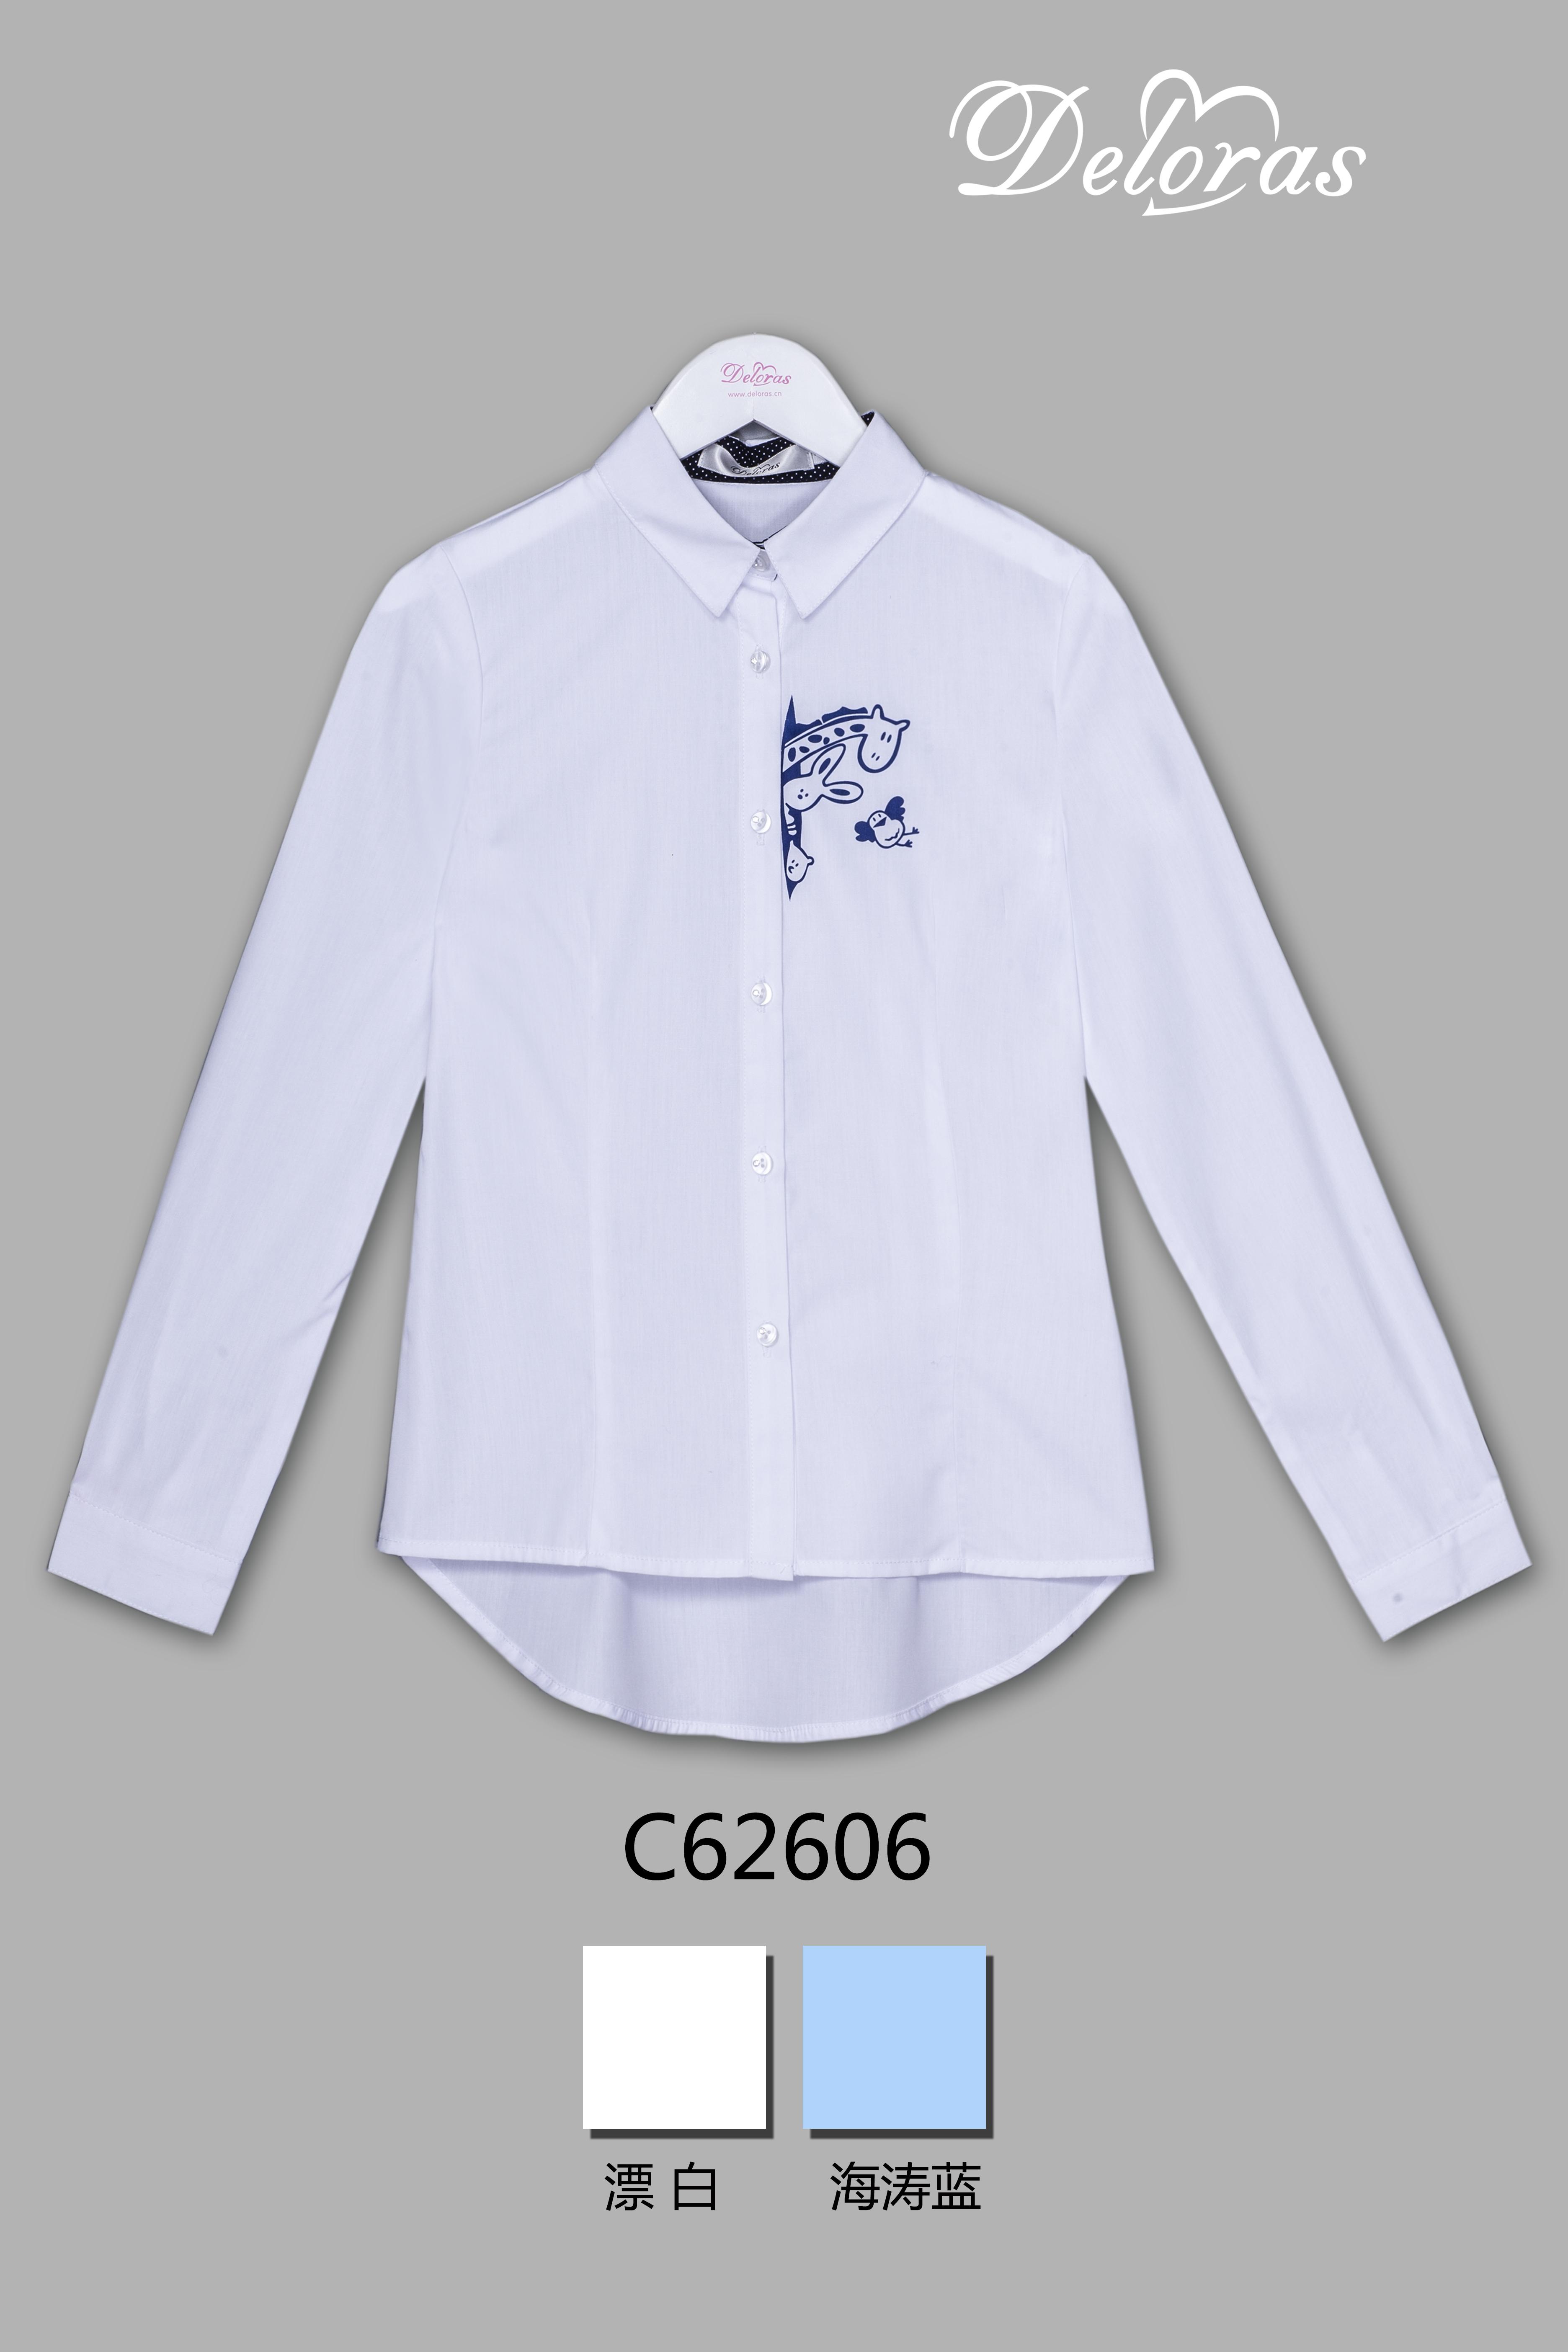 Блузка для девочки BHDL62606